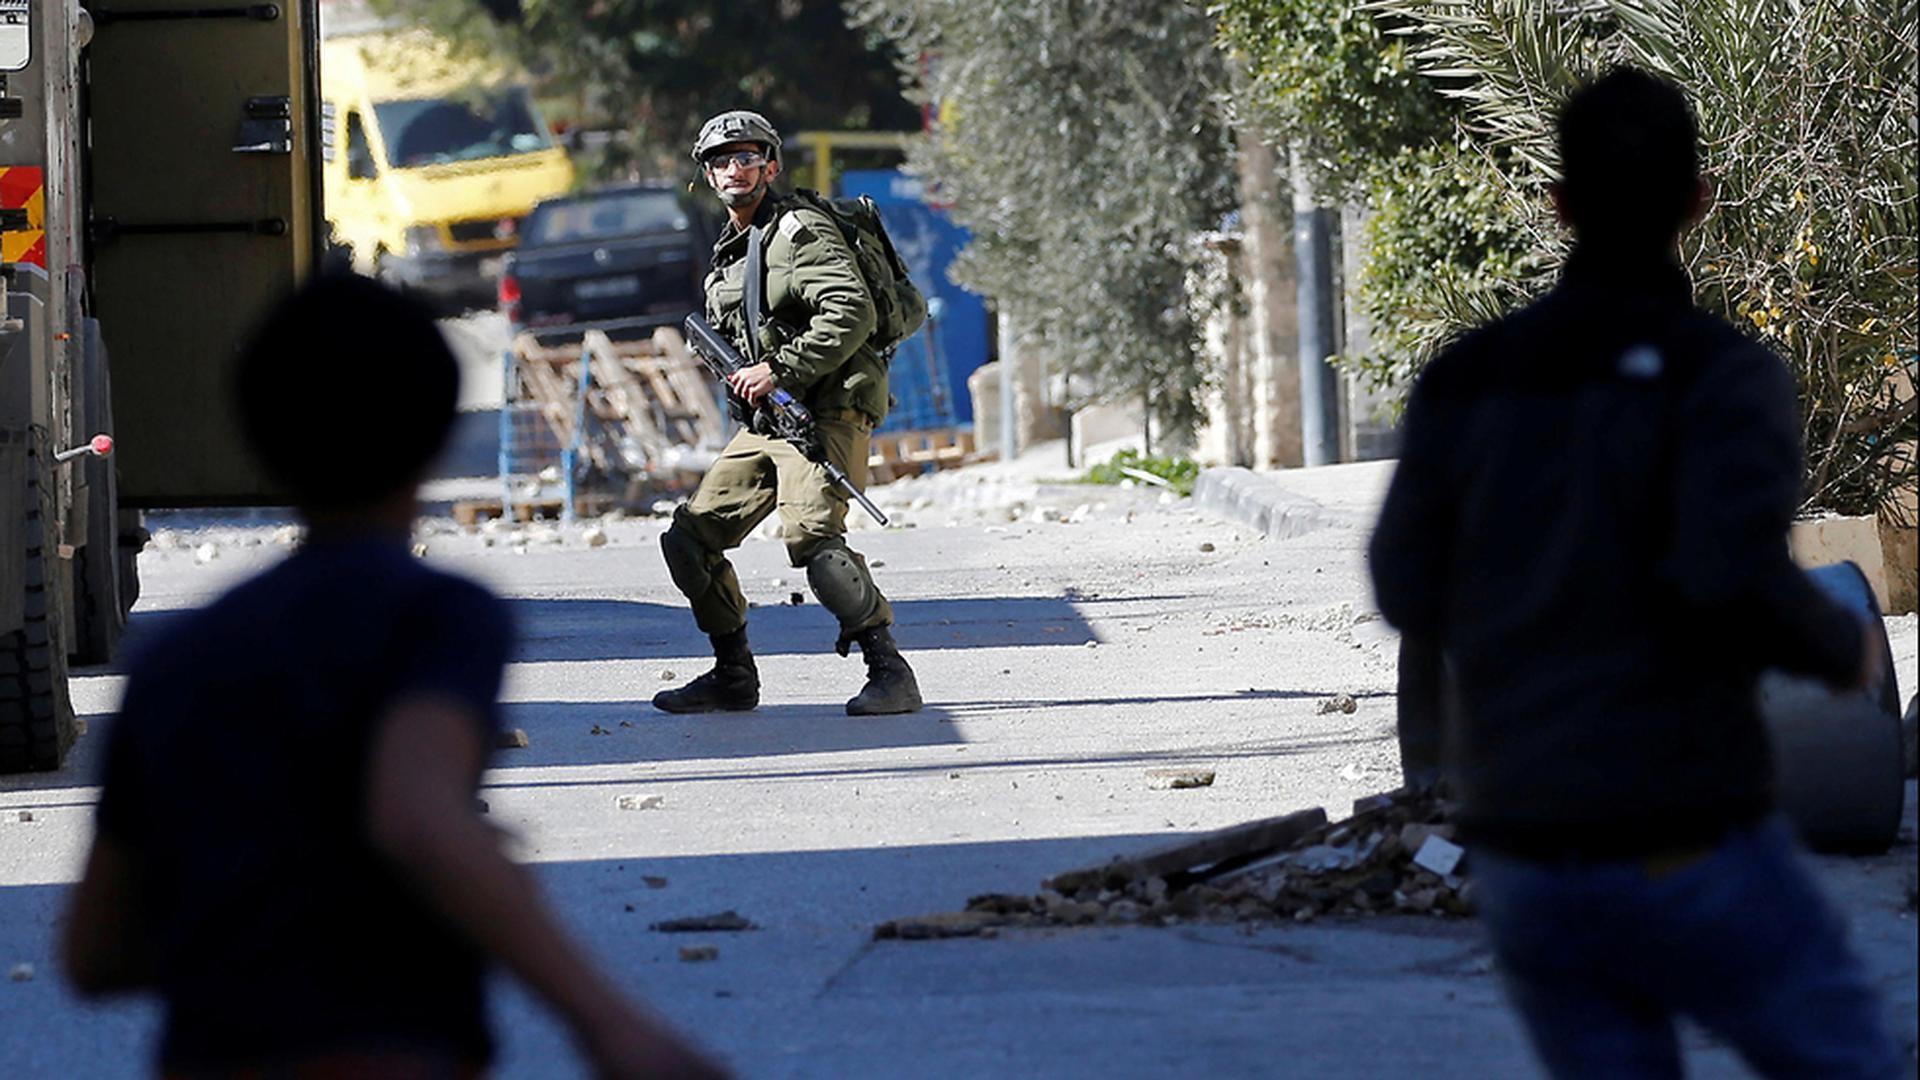 Tropas israelíes y palestinos se enfrentan en Beit Jala.